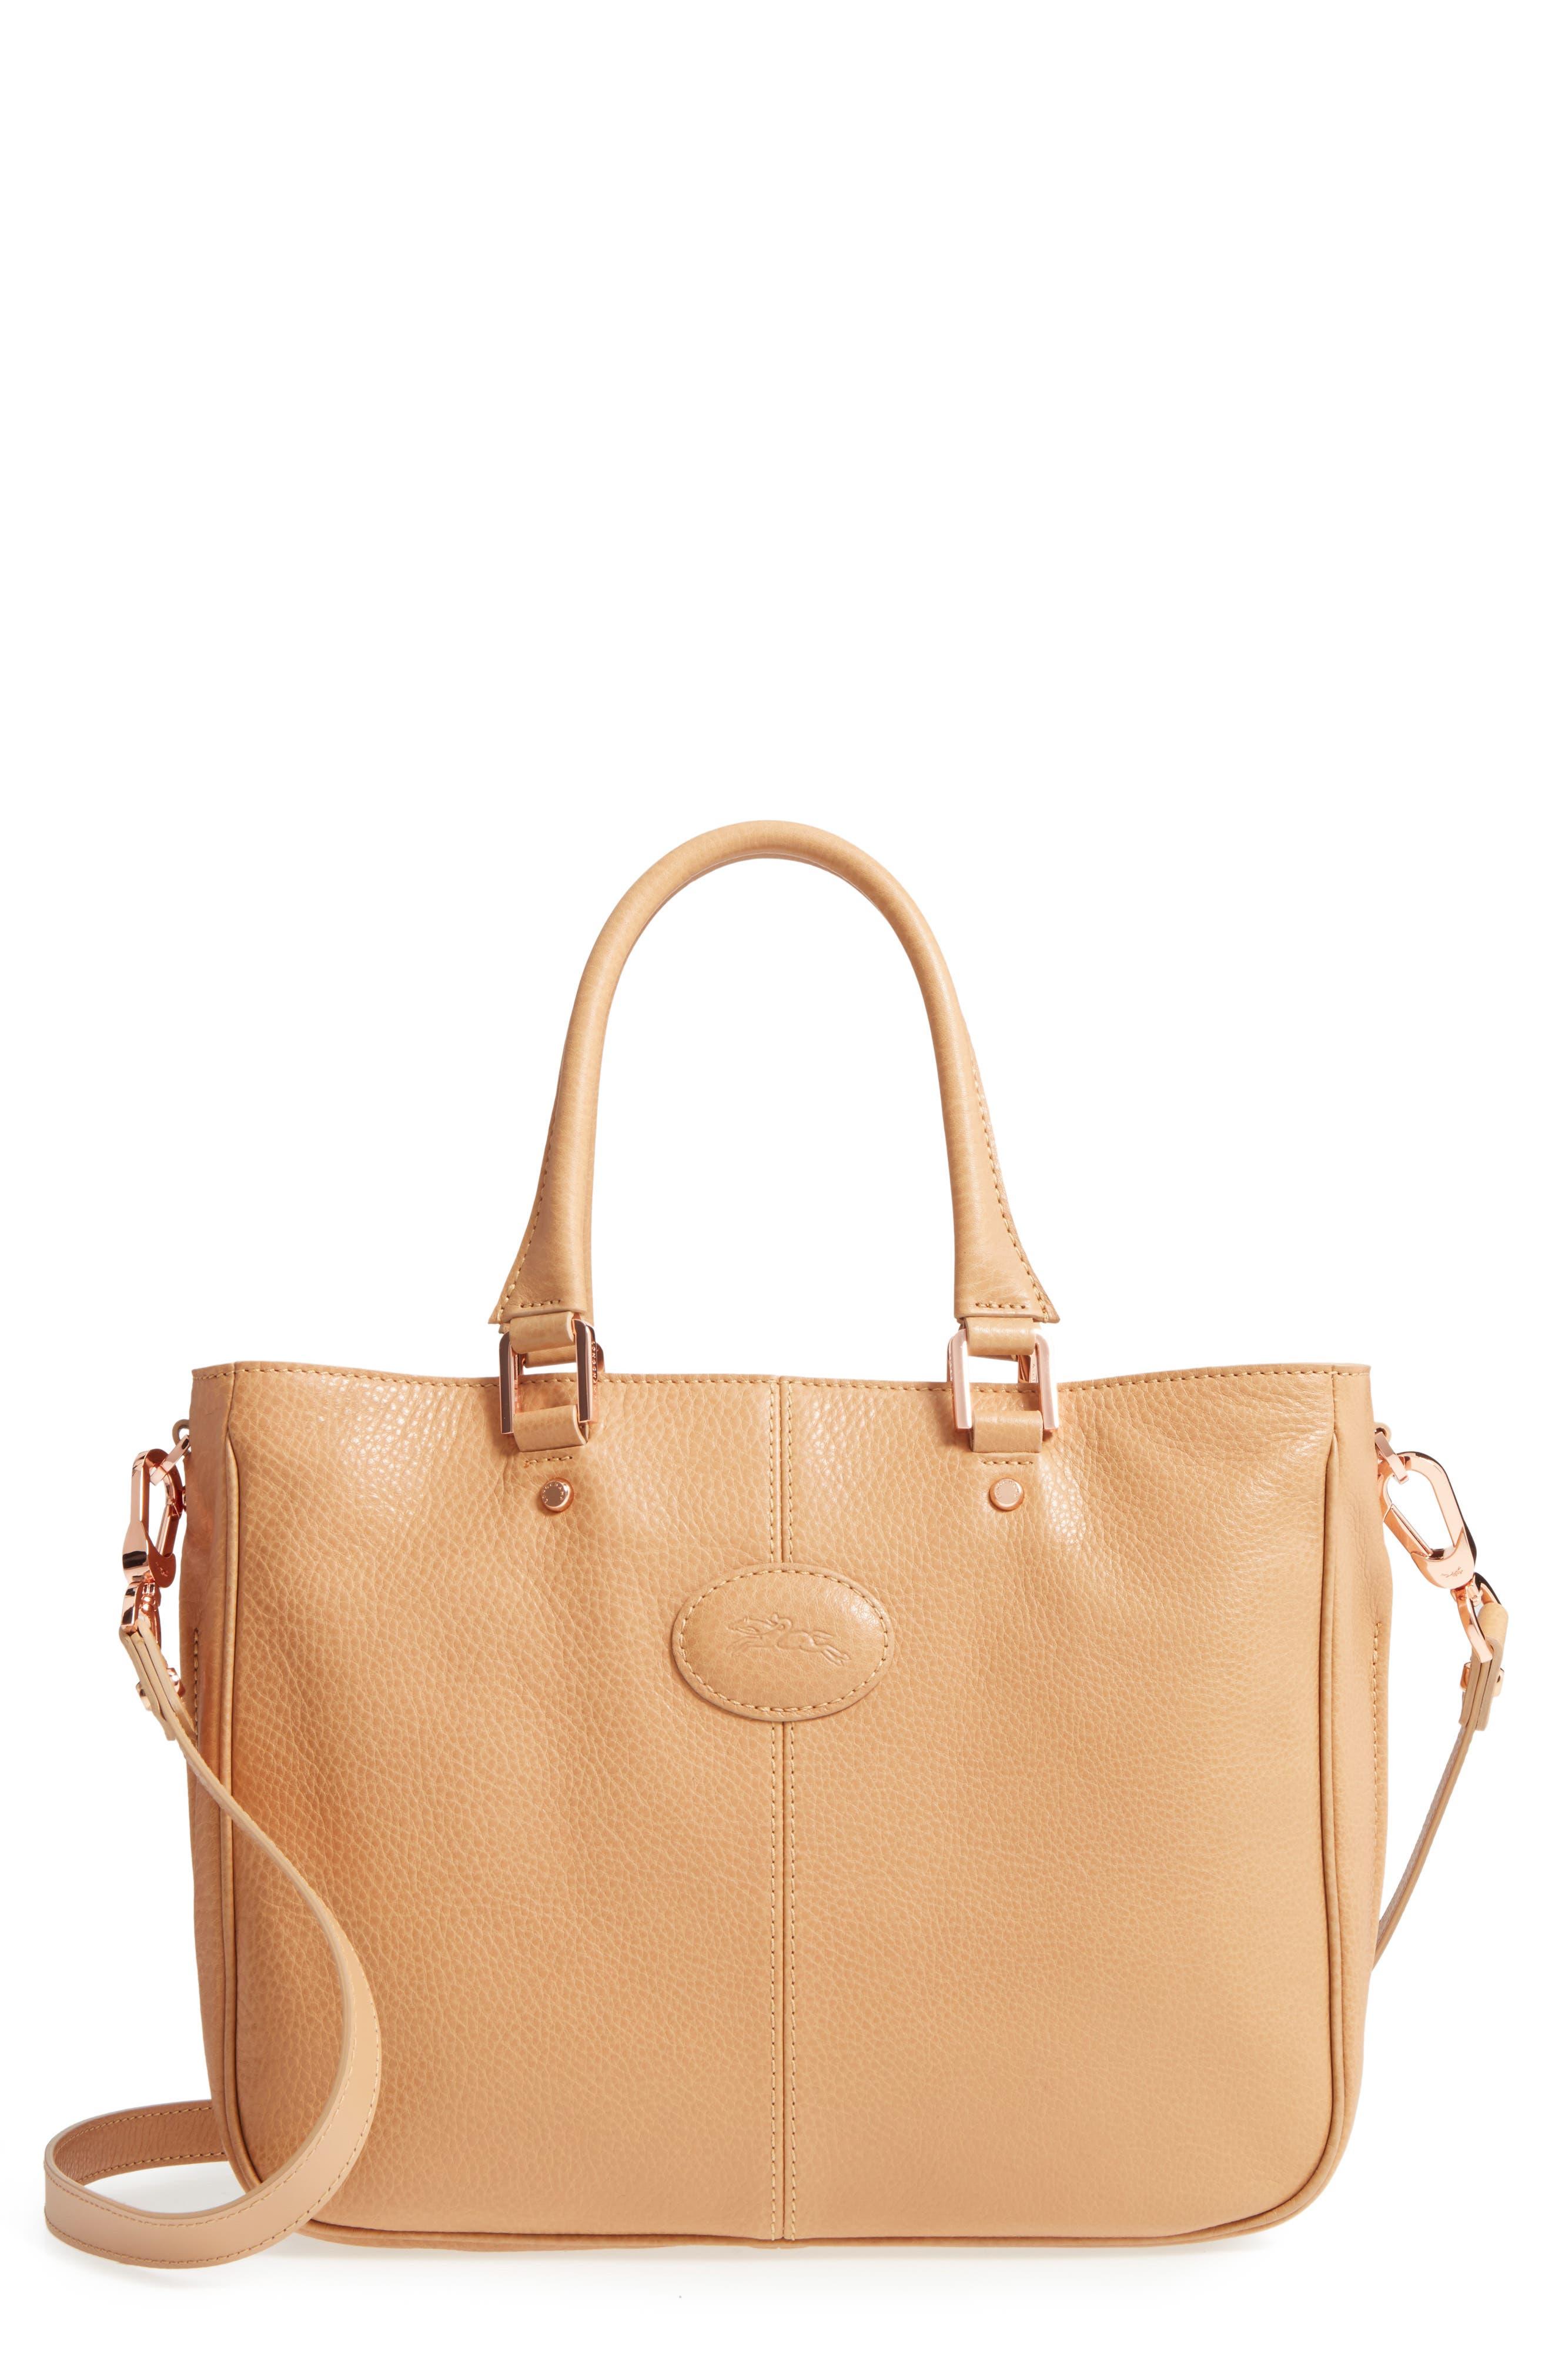 Main Image - Longchamp Mystery Leather Satchel